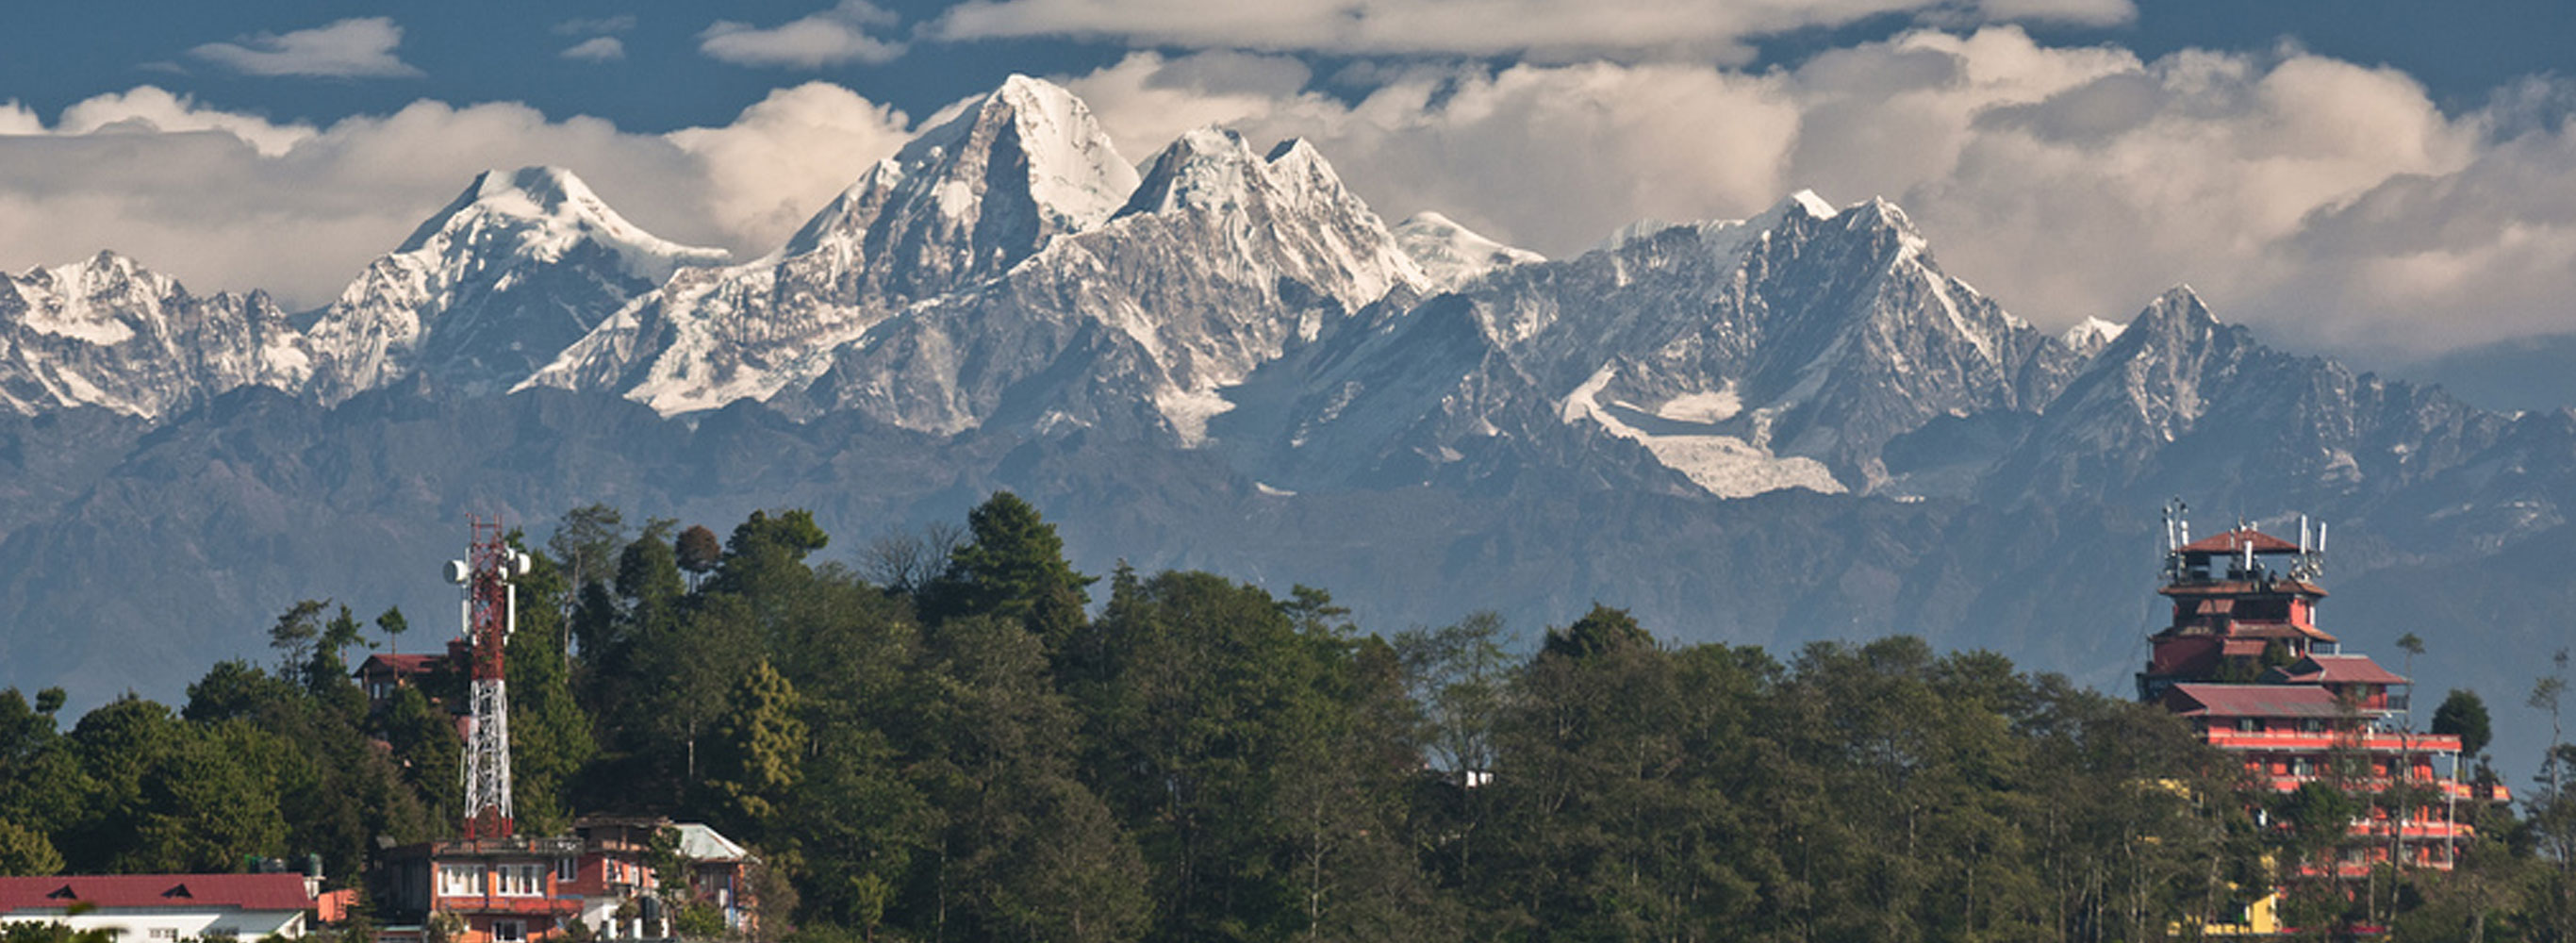 Nagarkot Trekking - 3 Days